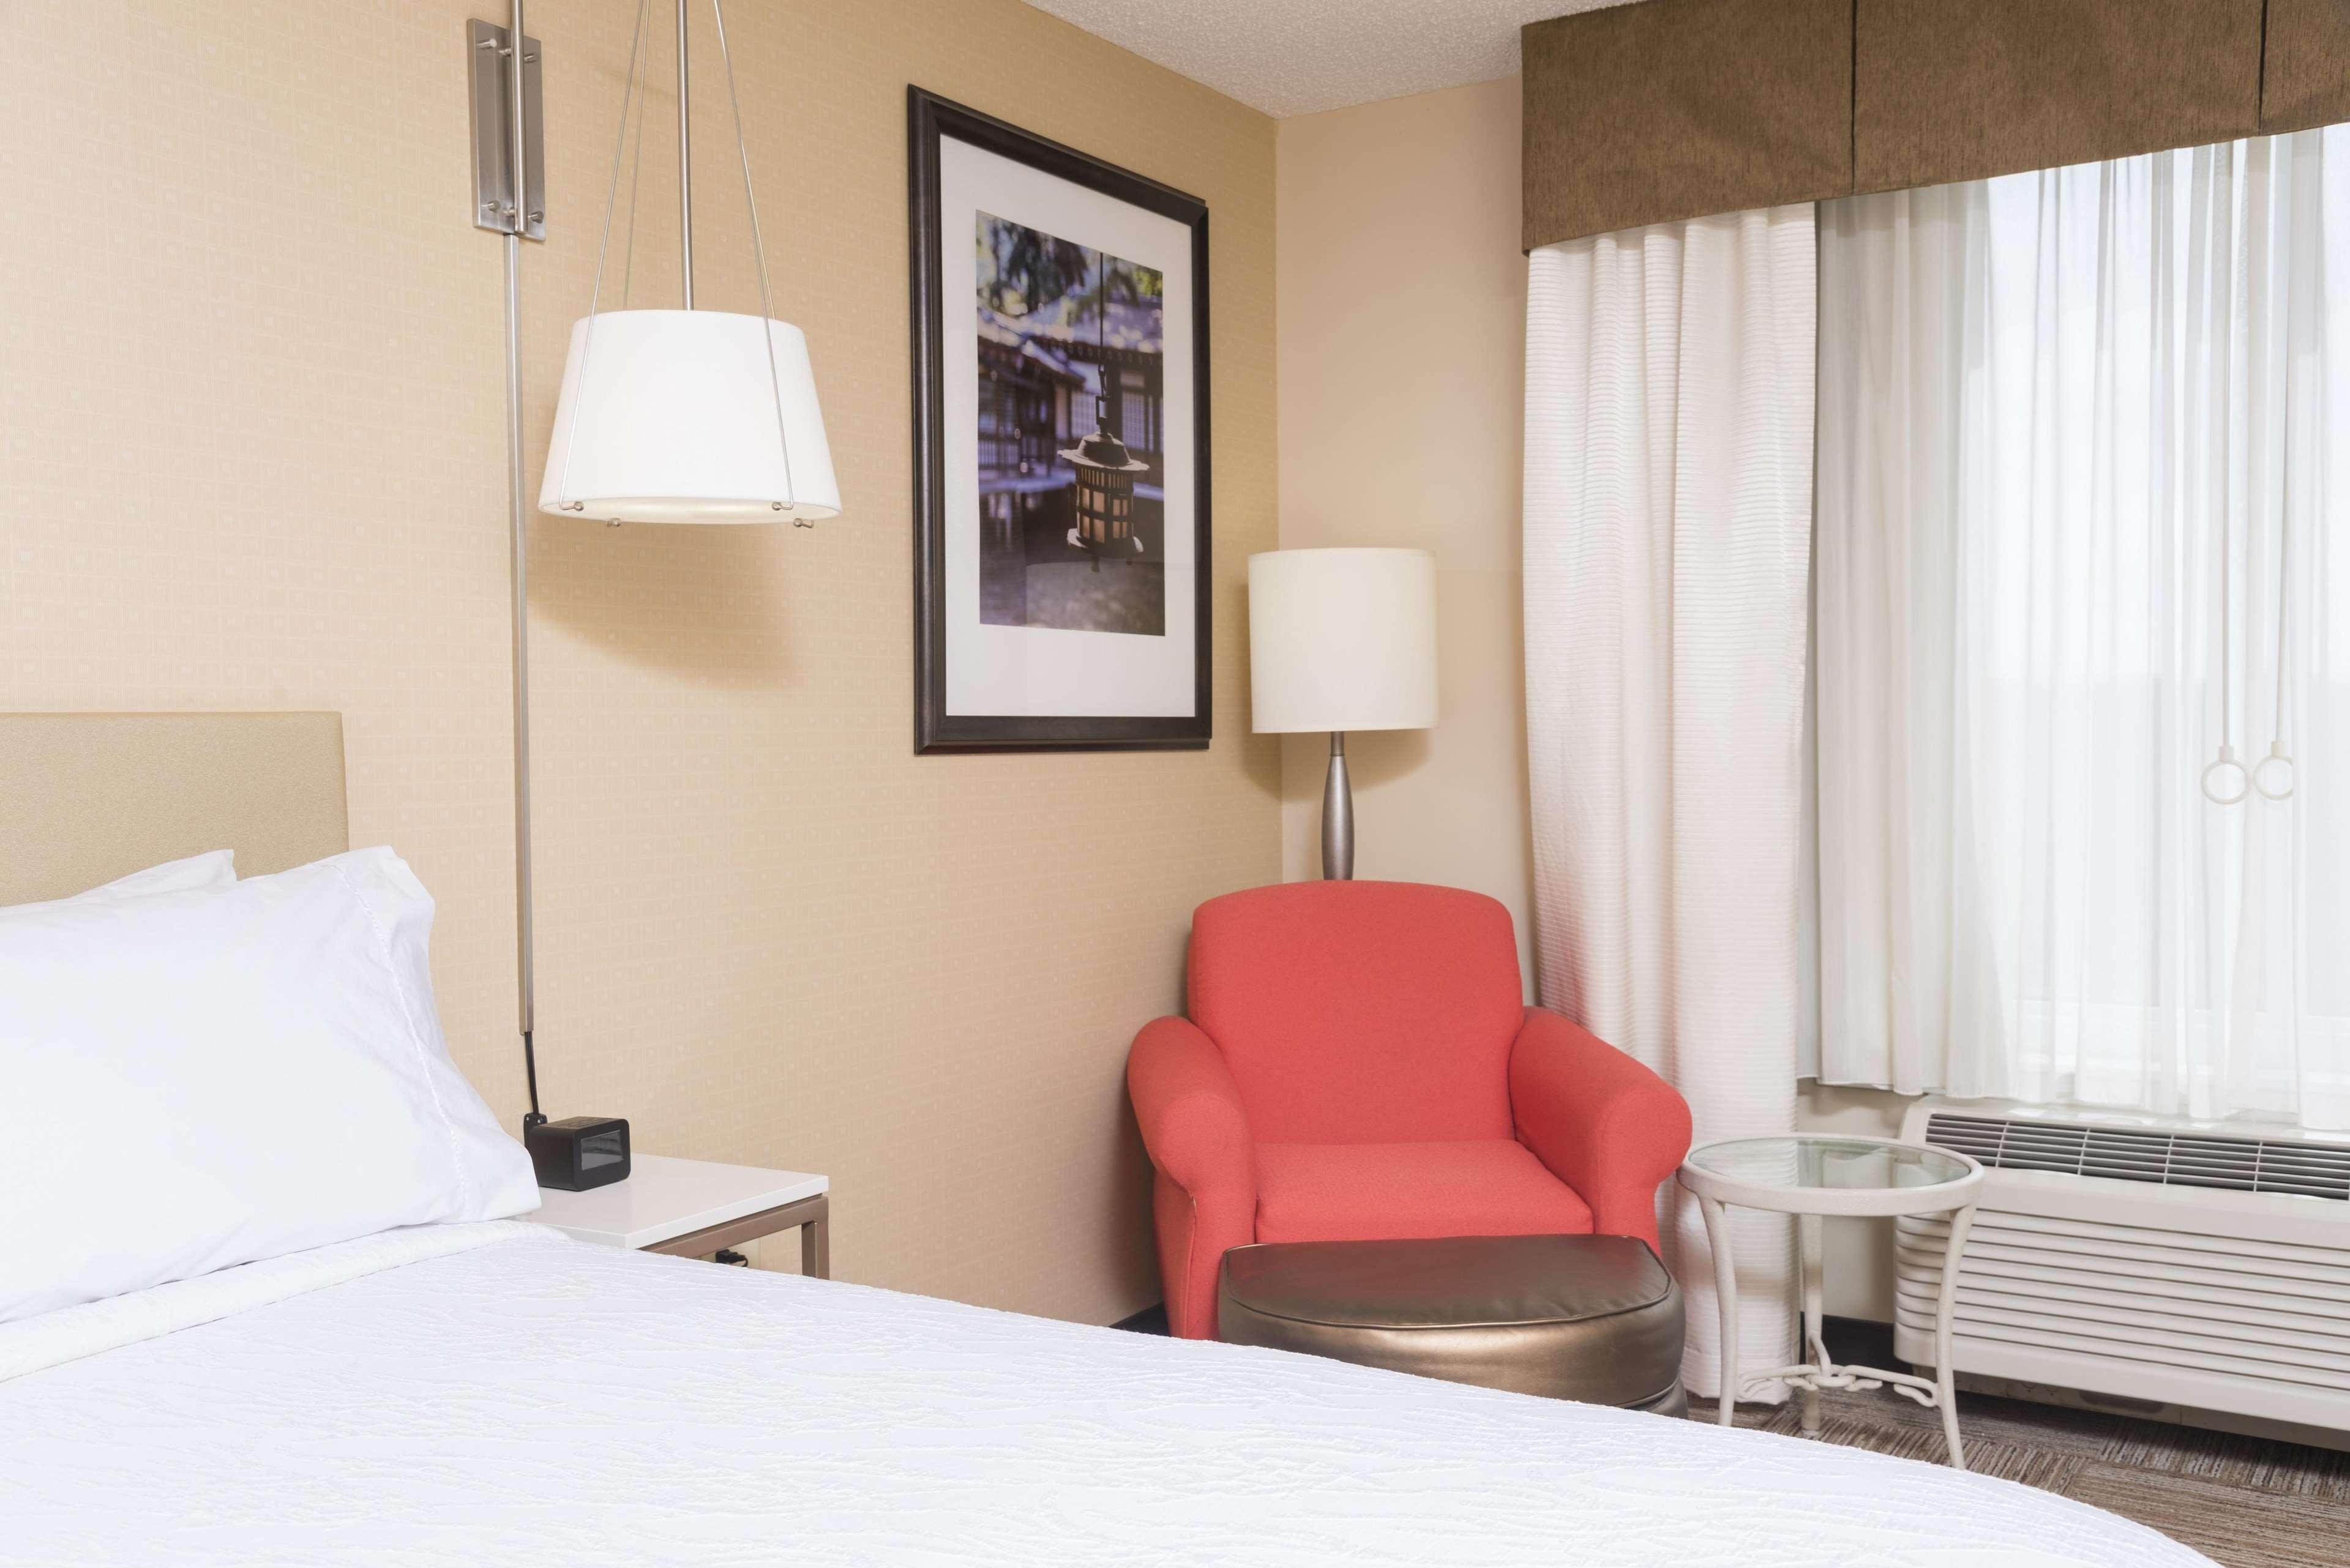 Hilton Garden Inn West Lafayette Wabash Landing image 22